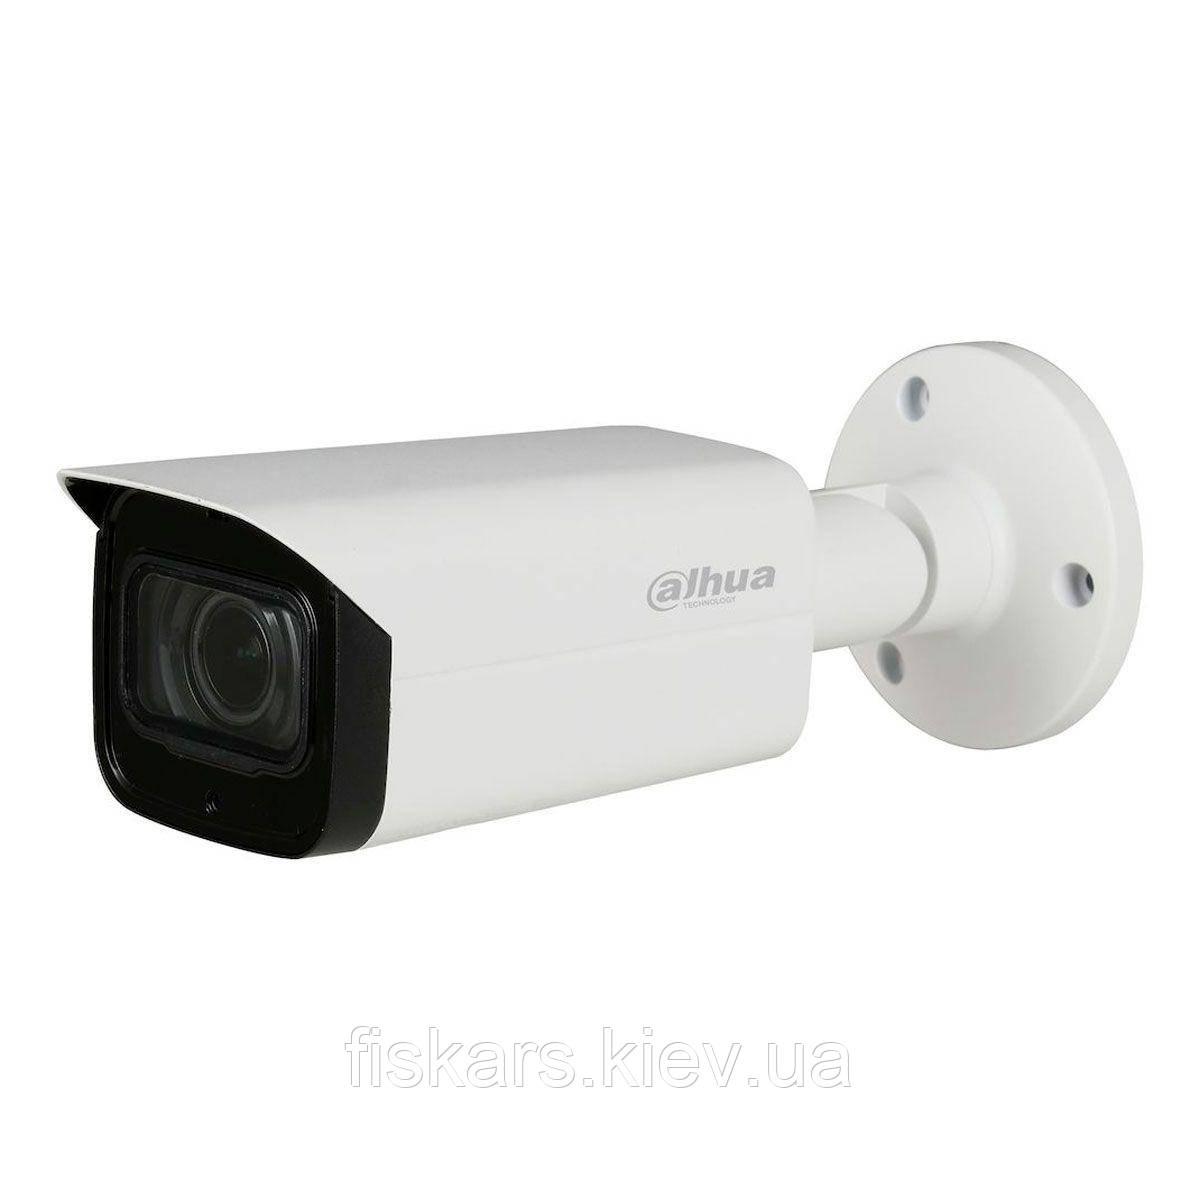 HD-CVI видеокамера Dahua DH-HAC-HFW2501TP-I8-A 3.6 мм